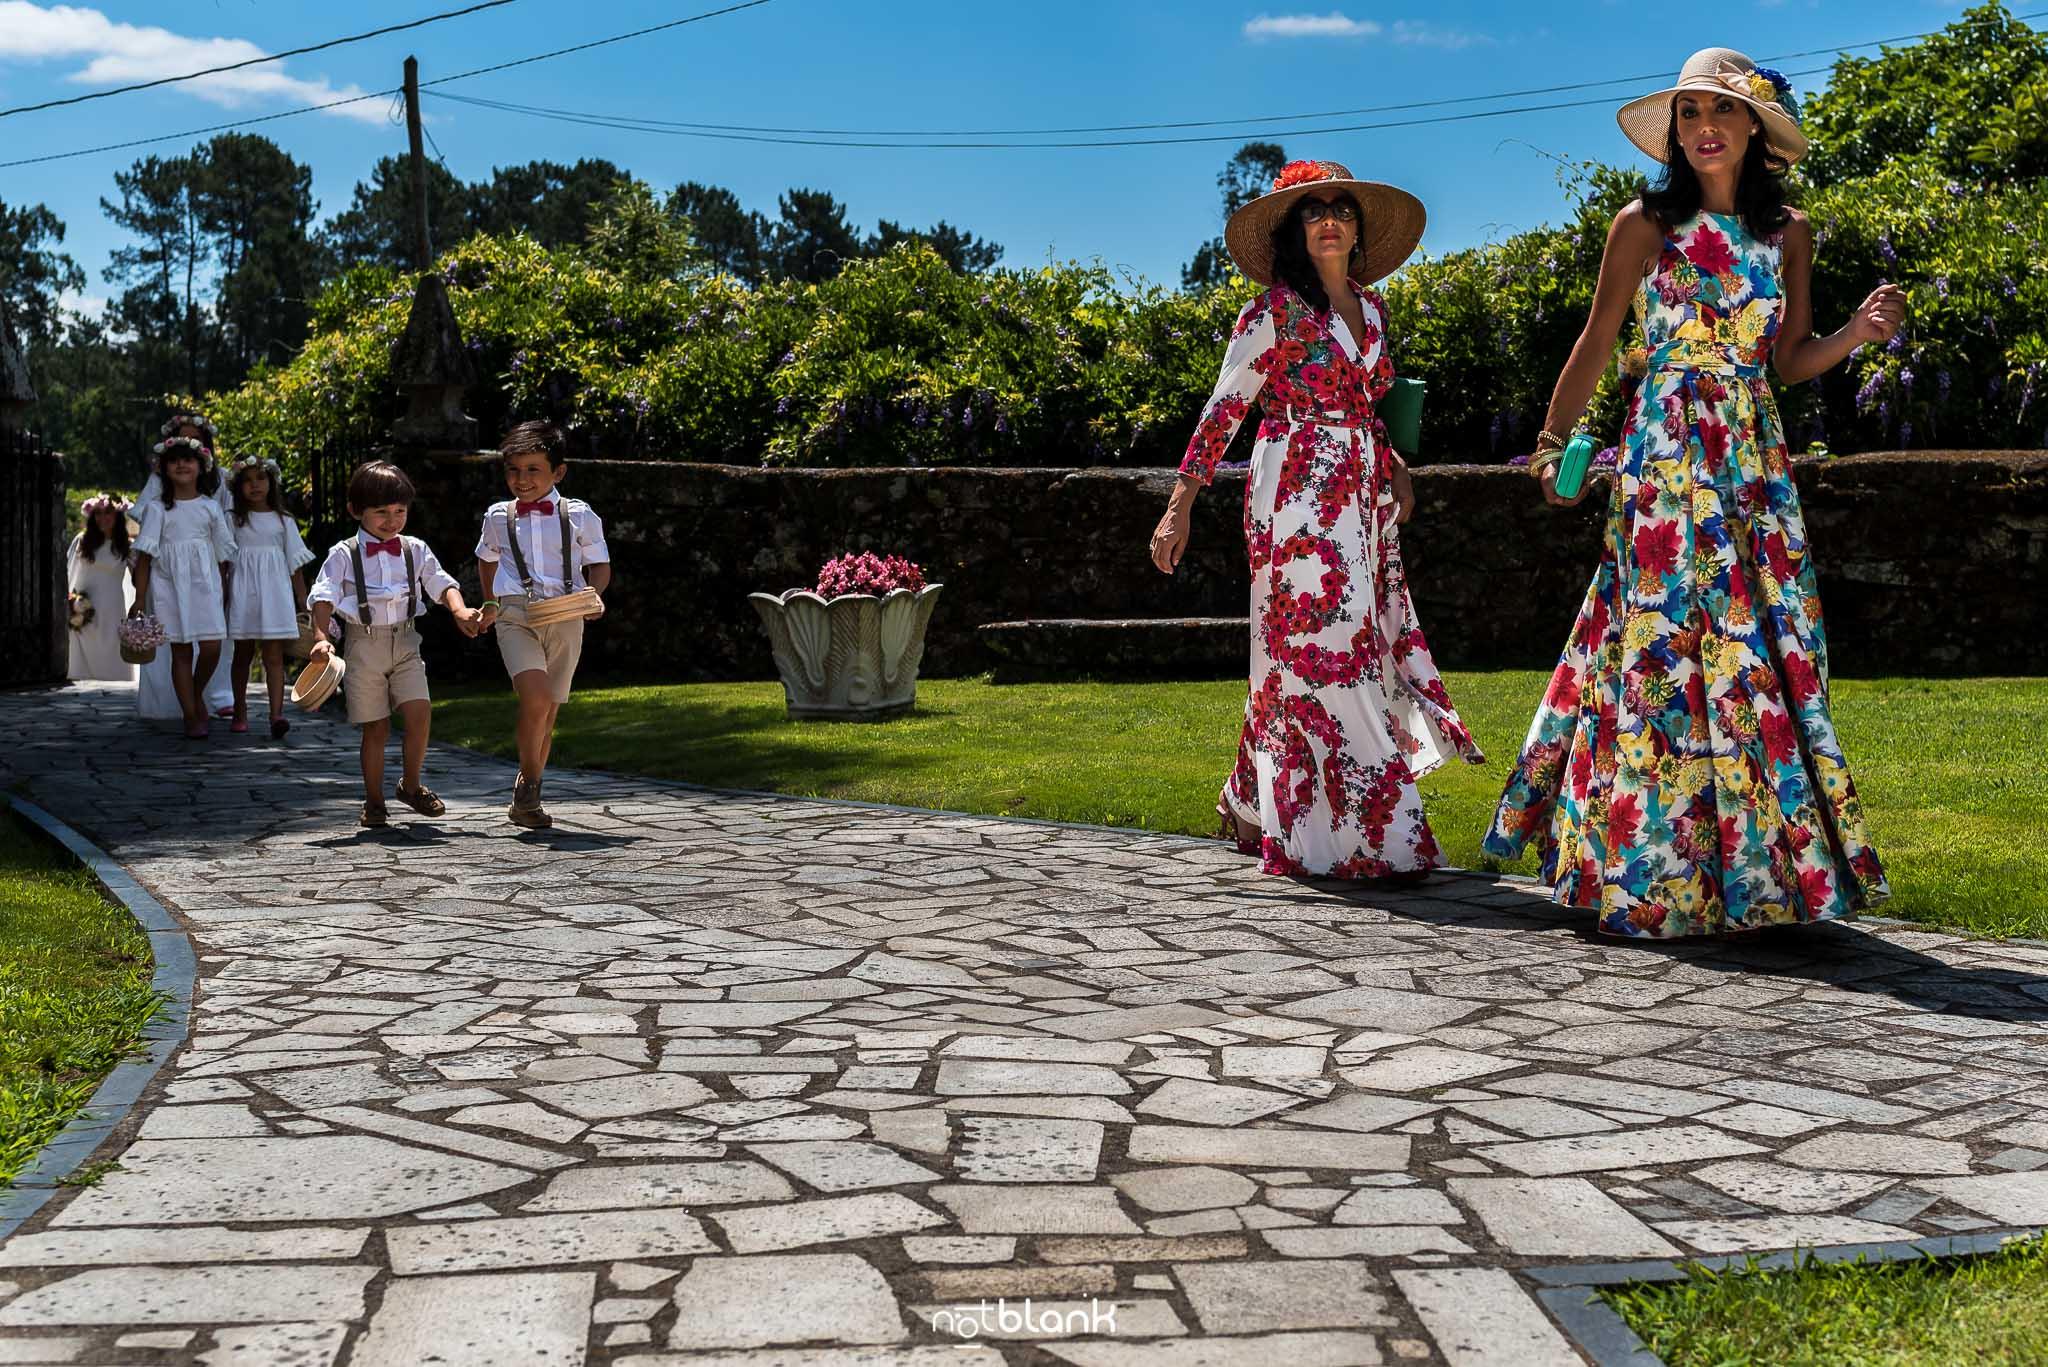 boda pazo moreira ponteareas-Postboda-Fotografos-de-Boda-Vigo-Tui-Pontevedra-Baixo-Miño-Portugal-Orense-La Guardia-Ponteareas